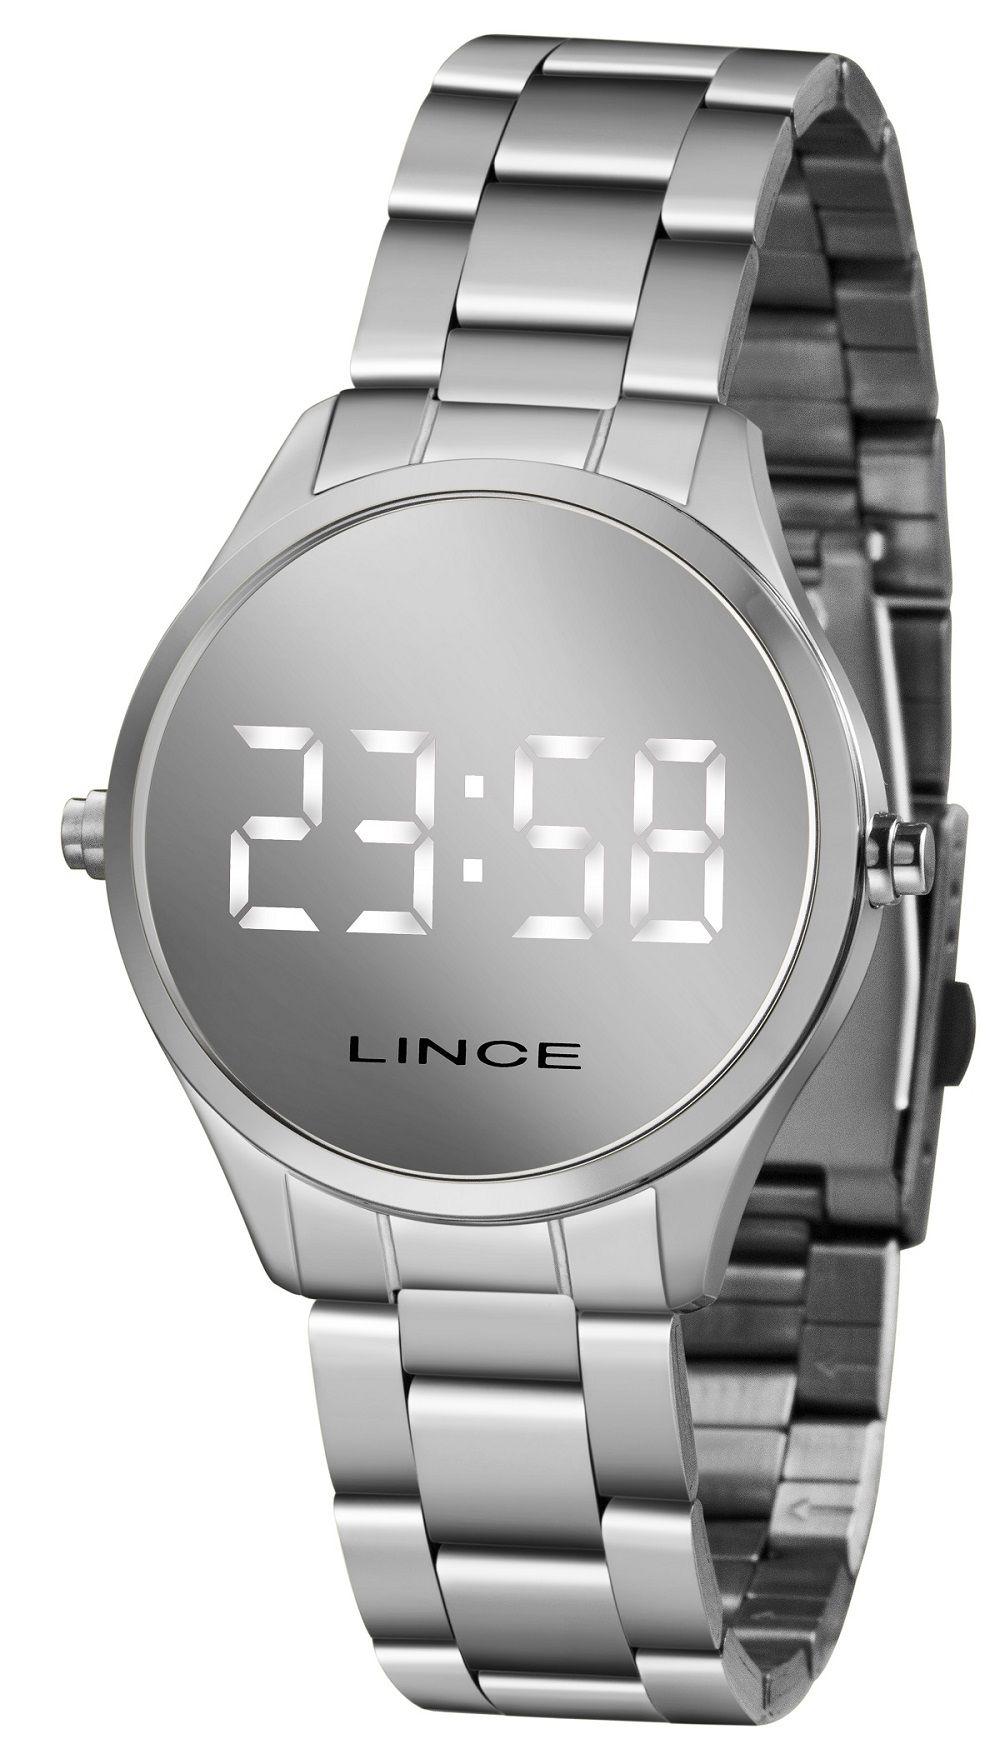 Relógio Lince Prata MDM4617LBXSX